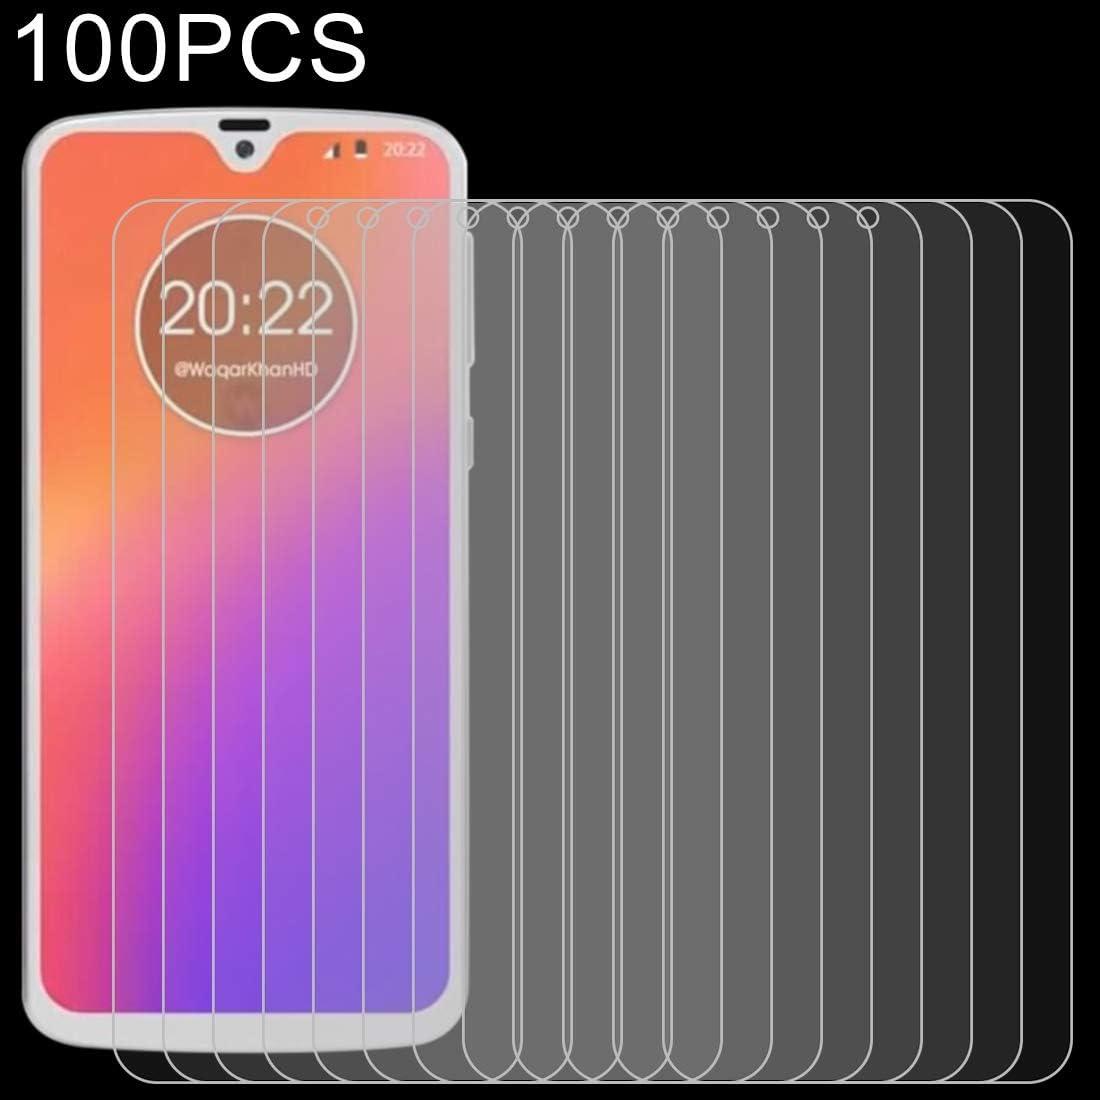 GUOSHU Premium Tempered Glass Screen Film 100 PCS 0.26mm 9H 2.5D Explosion-Proof Tempered Glass Film for Motorola Moto G7 Anti-Scratch Screen Protector